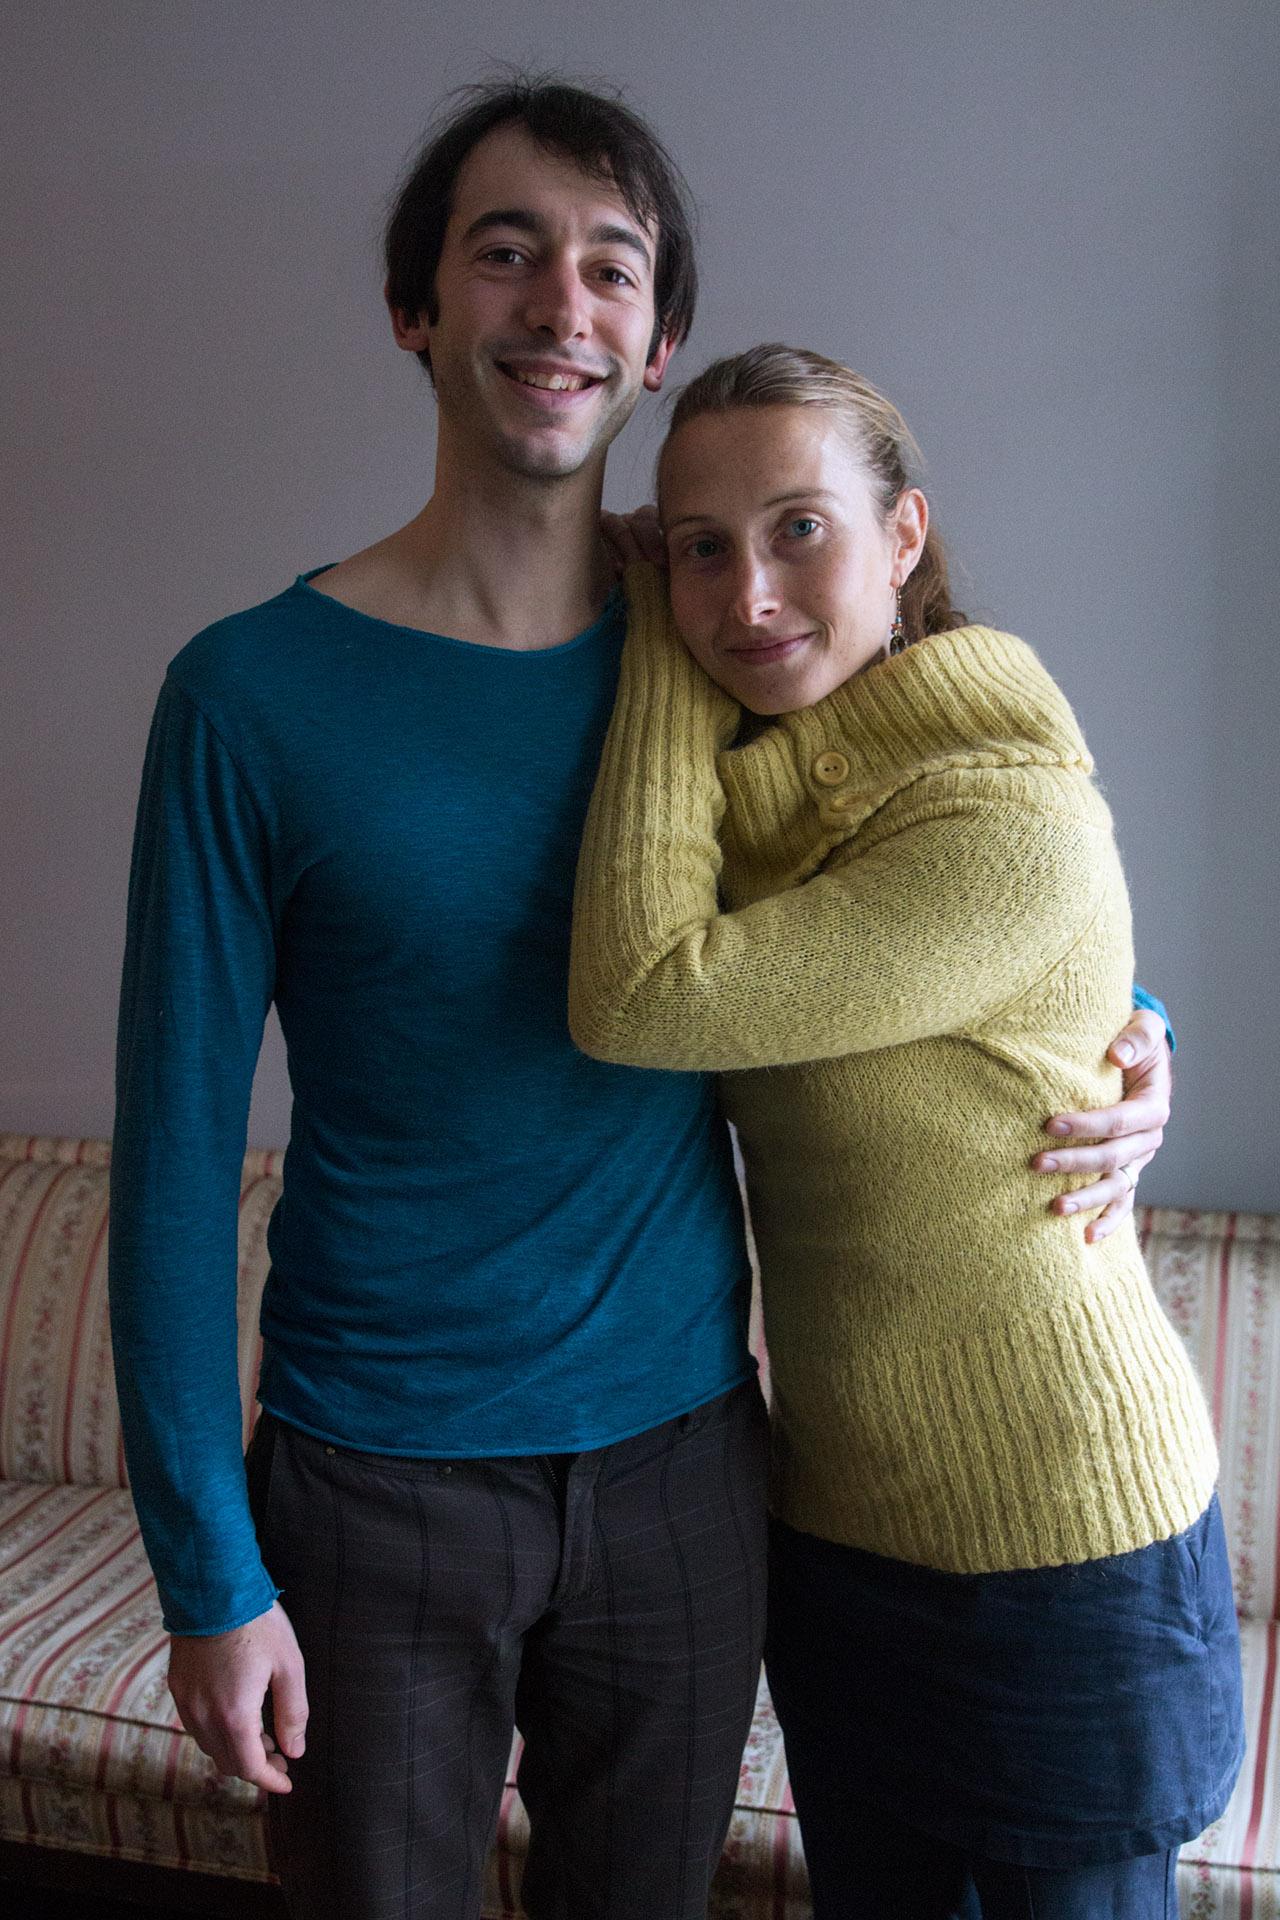 Raphaël and Raphaëlle